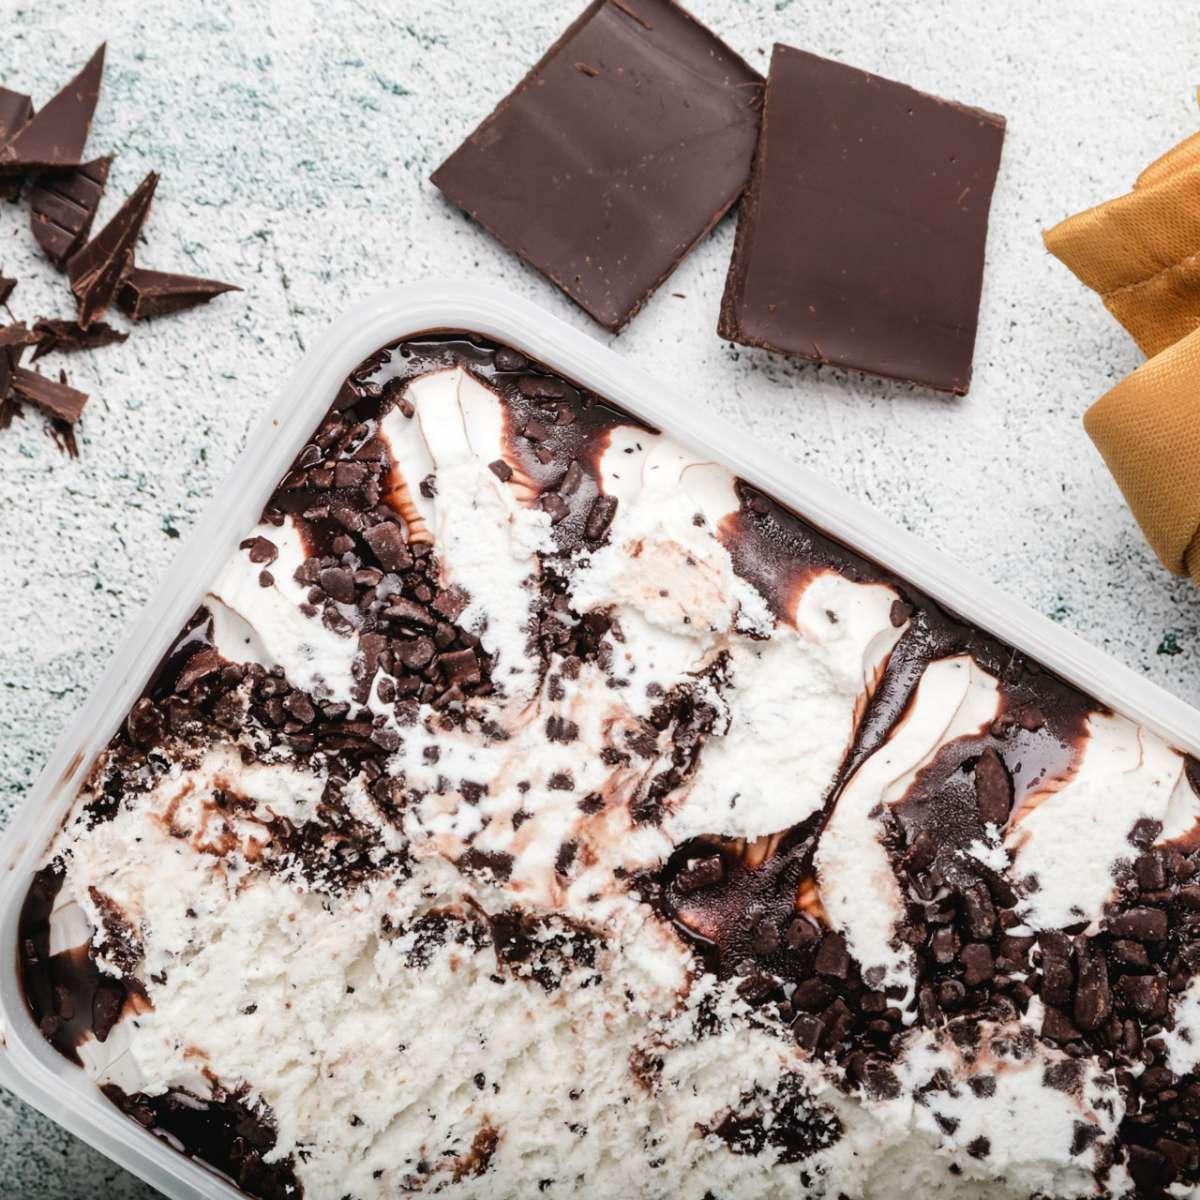 ice-cream-with-chocolate-chips-refreshing-straccia-XJS9GLN